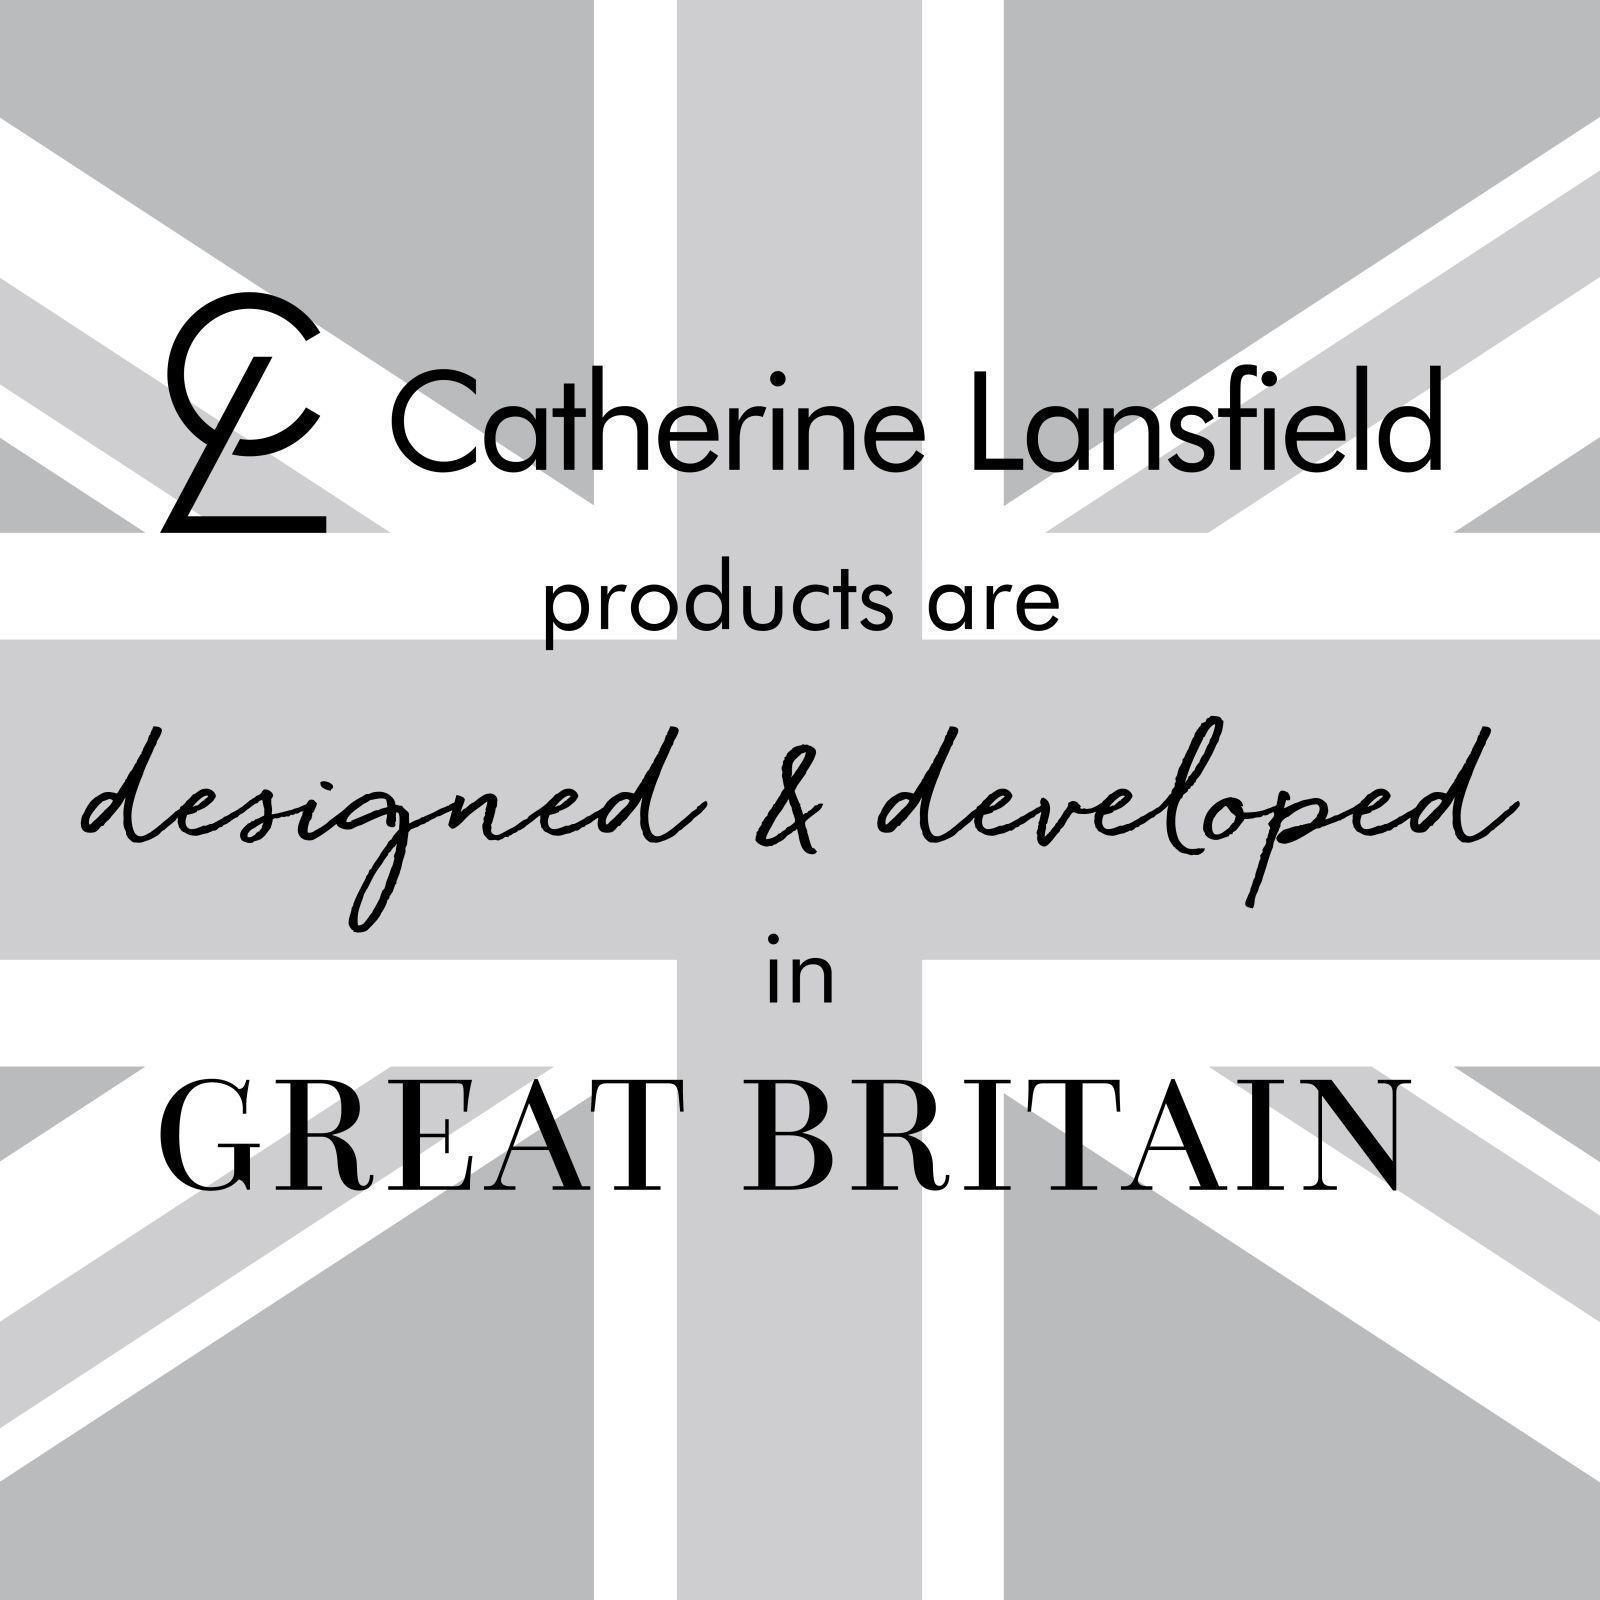 Catherine-Lansfield-Salisbury-Pink-cubierta-del-edredon-edredon-cubre-floral-de-conjuntos-de-cama miniatura 27